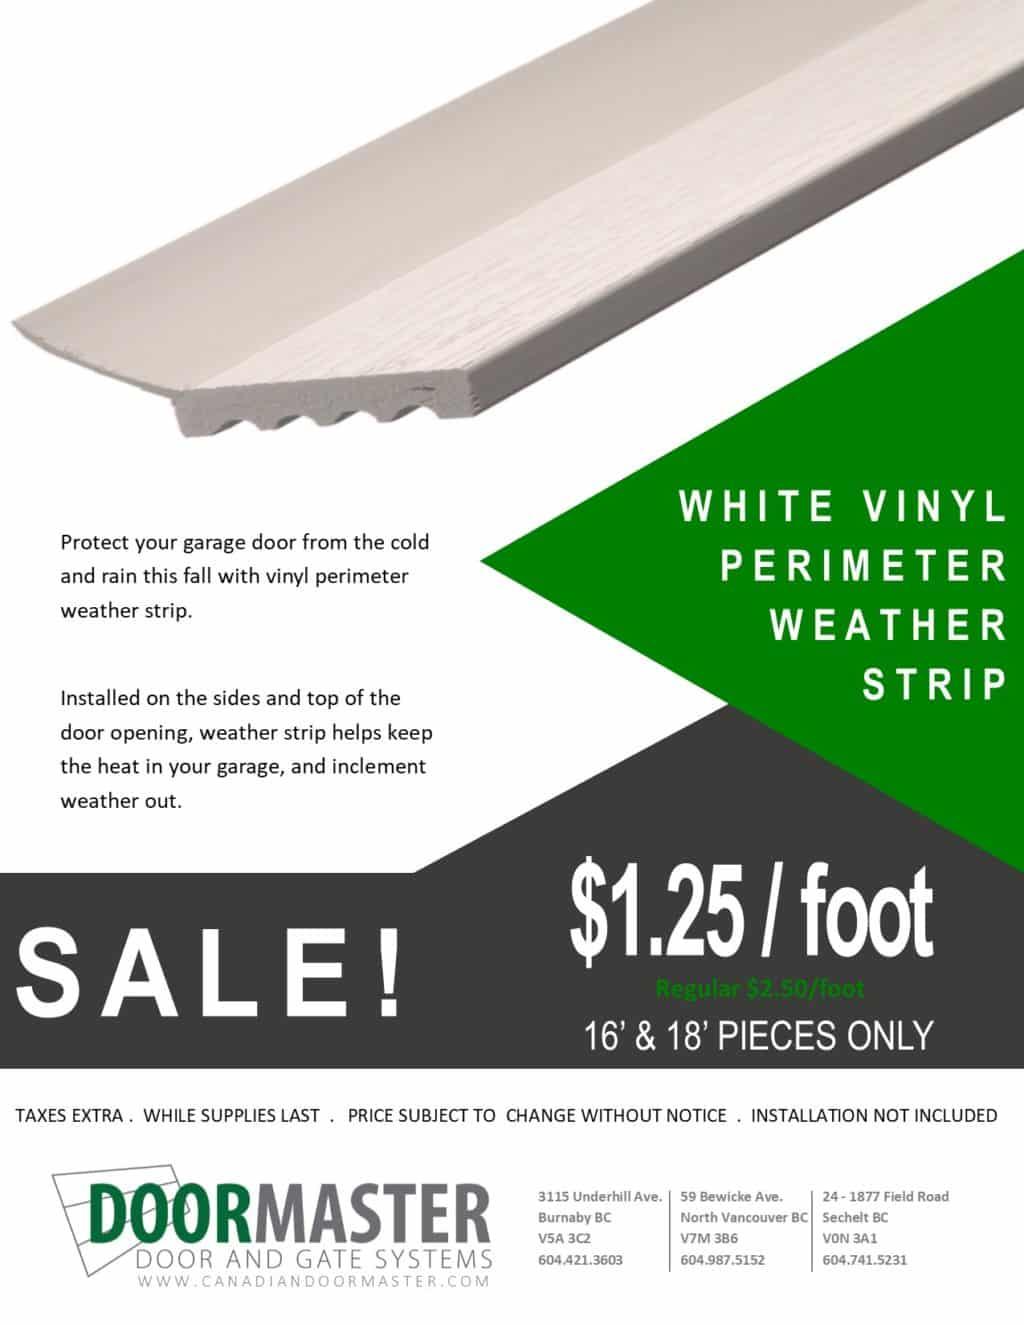 Weather Strip Promotion [SALE]